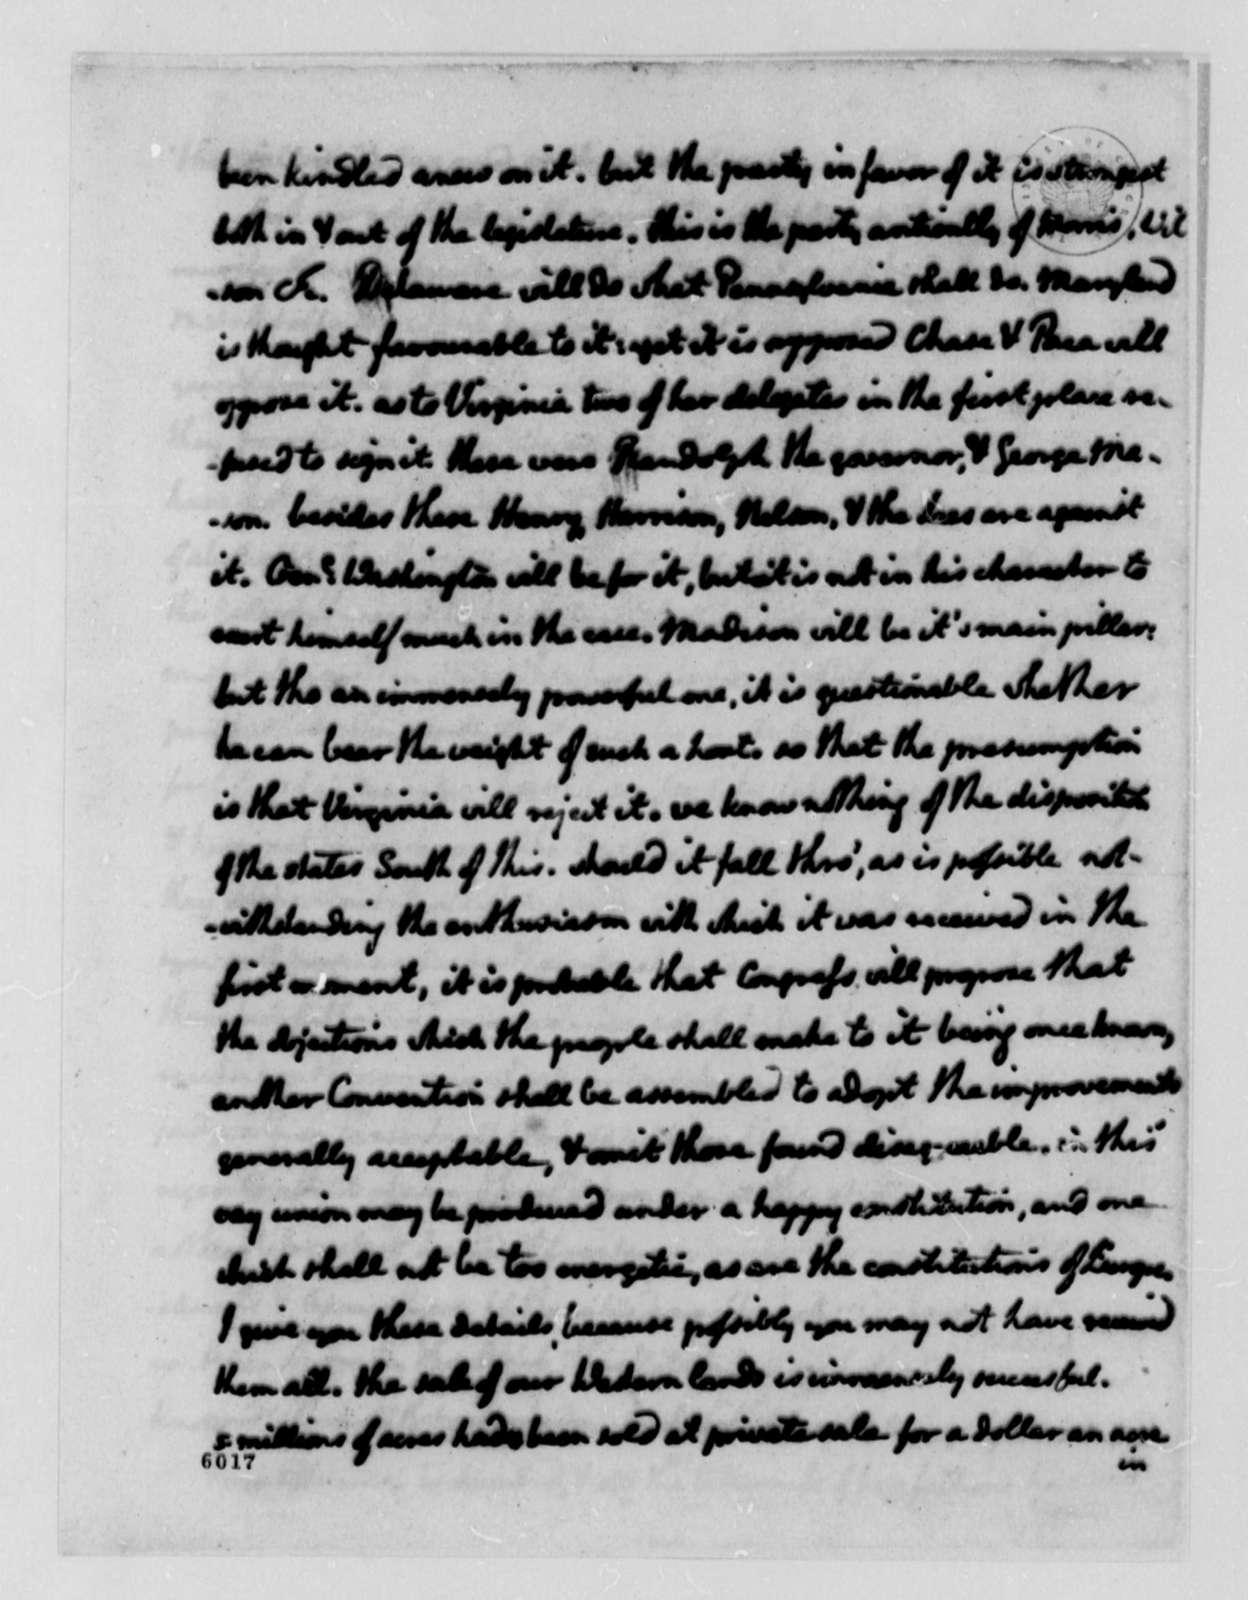 Thomas Jefferson to William Carmichael, December 15, 1787